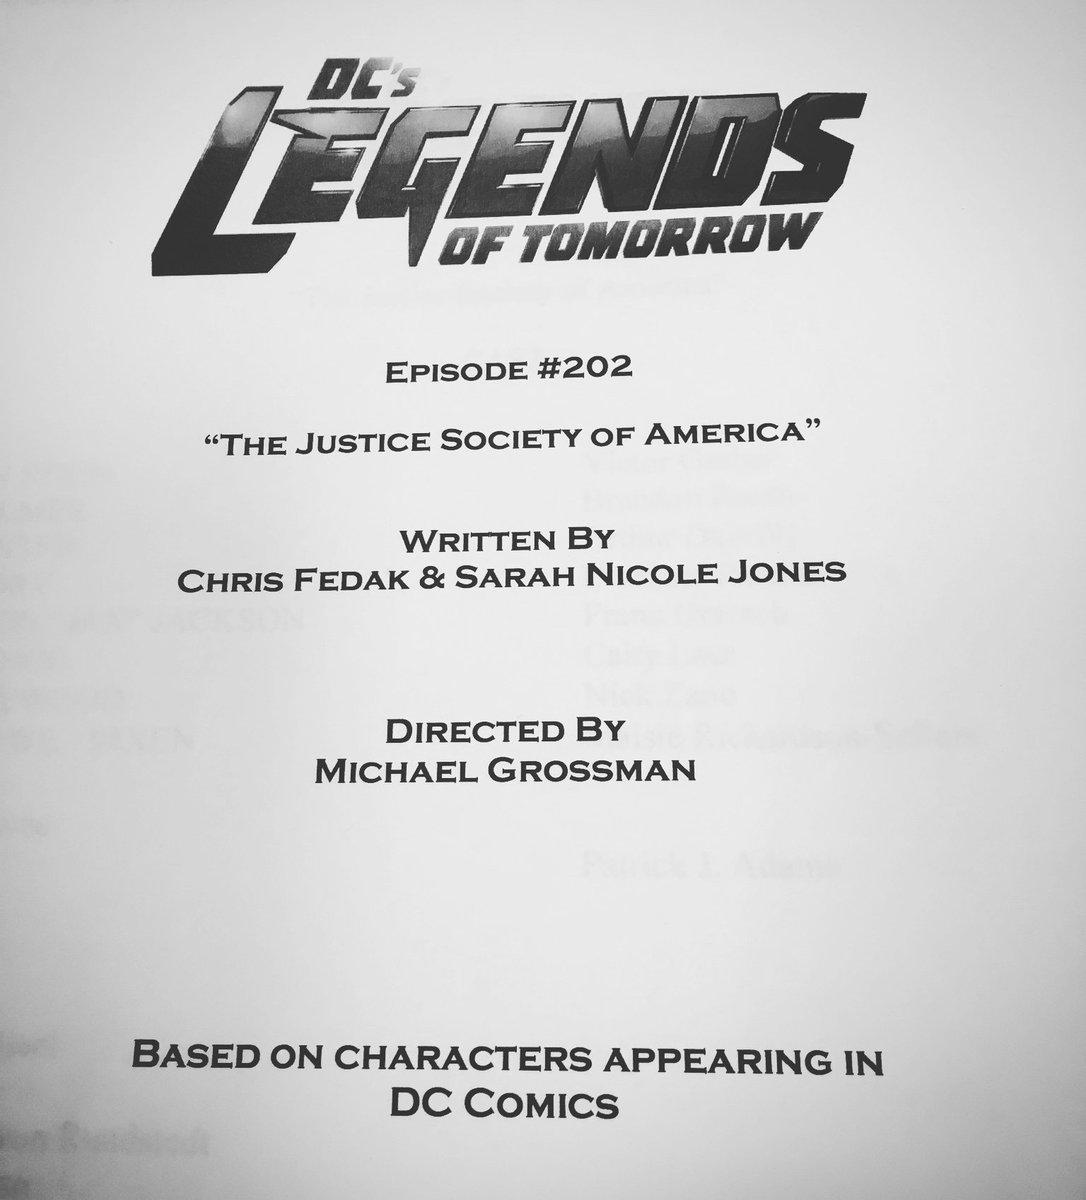 Caity Lotz JSA Legends of Tomorrow